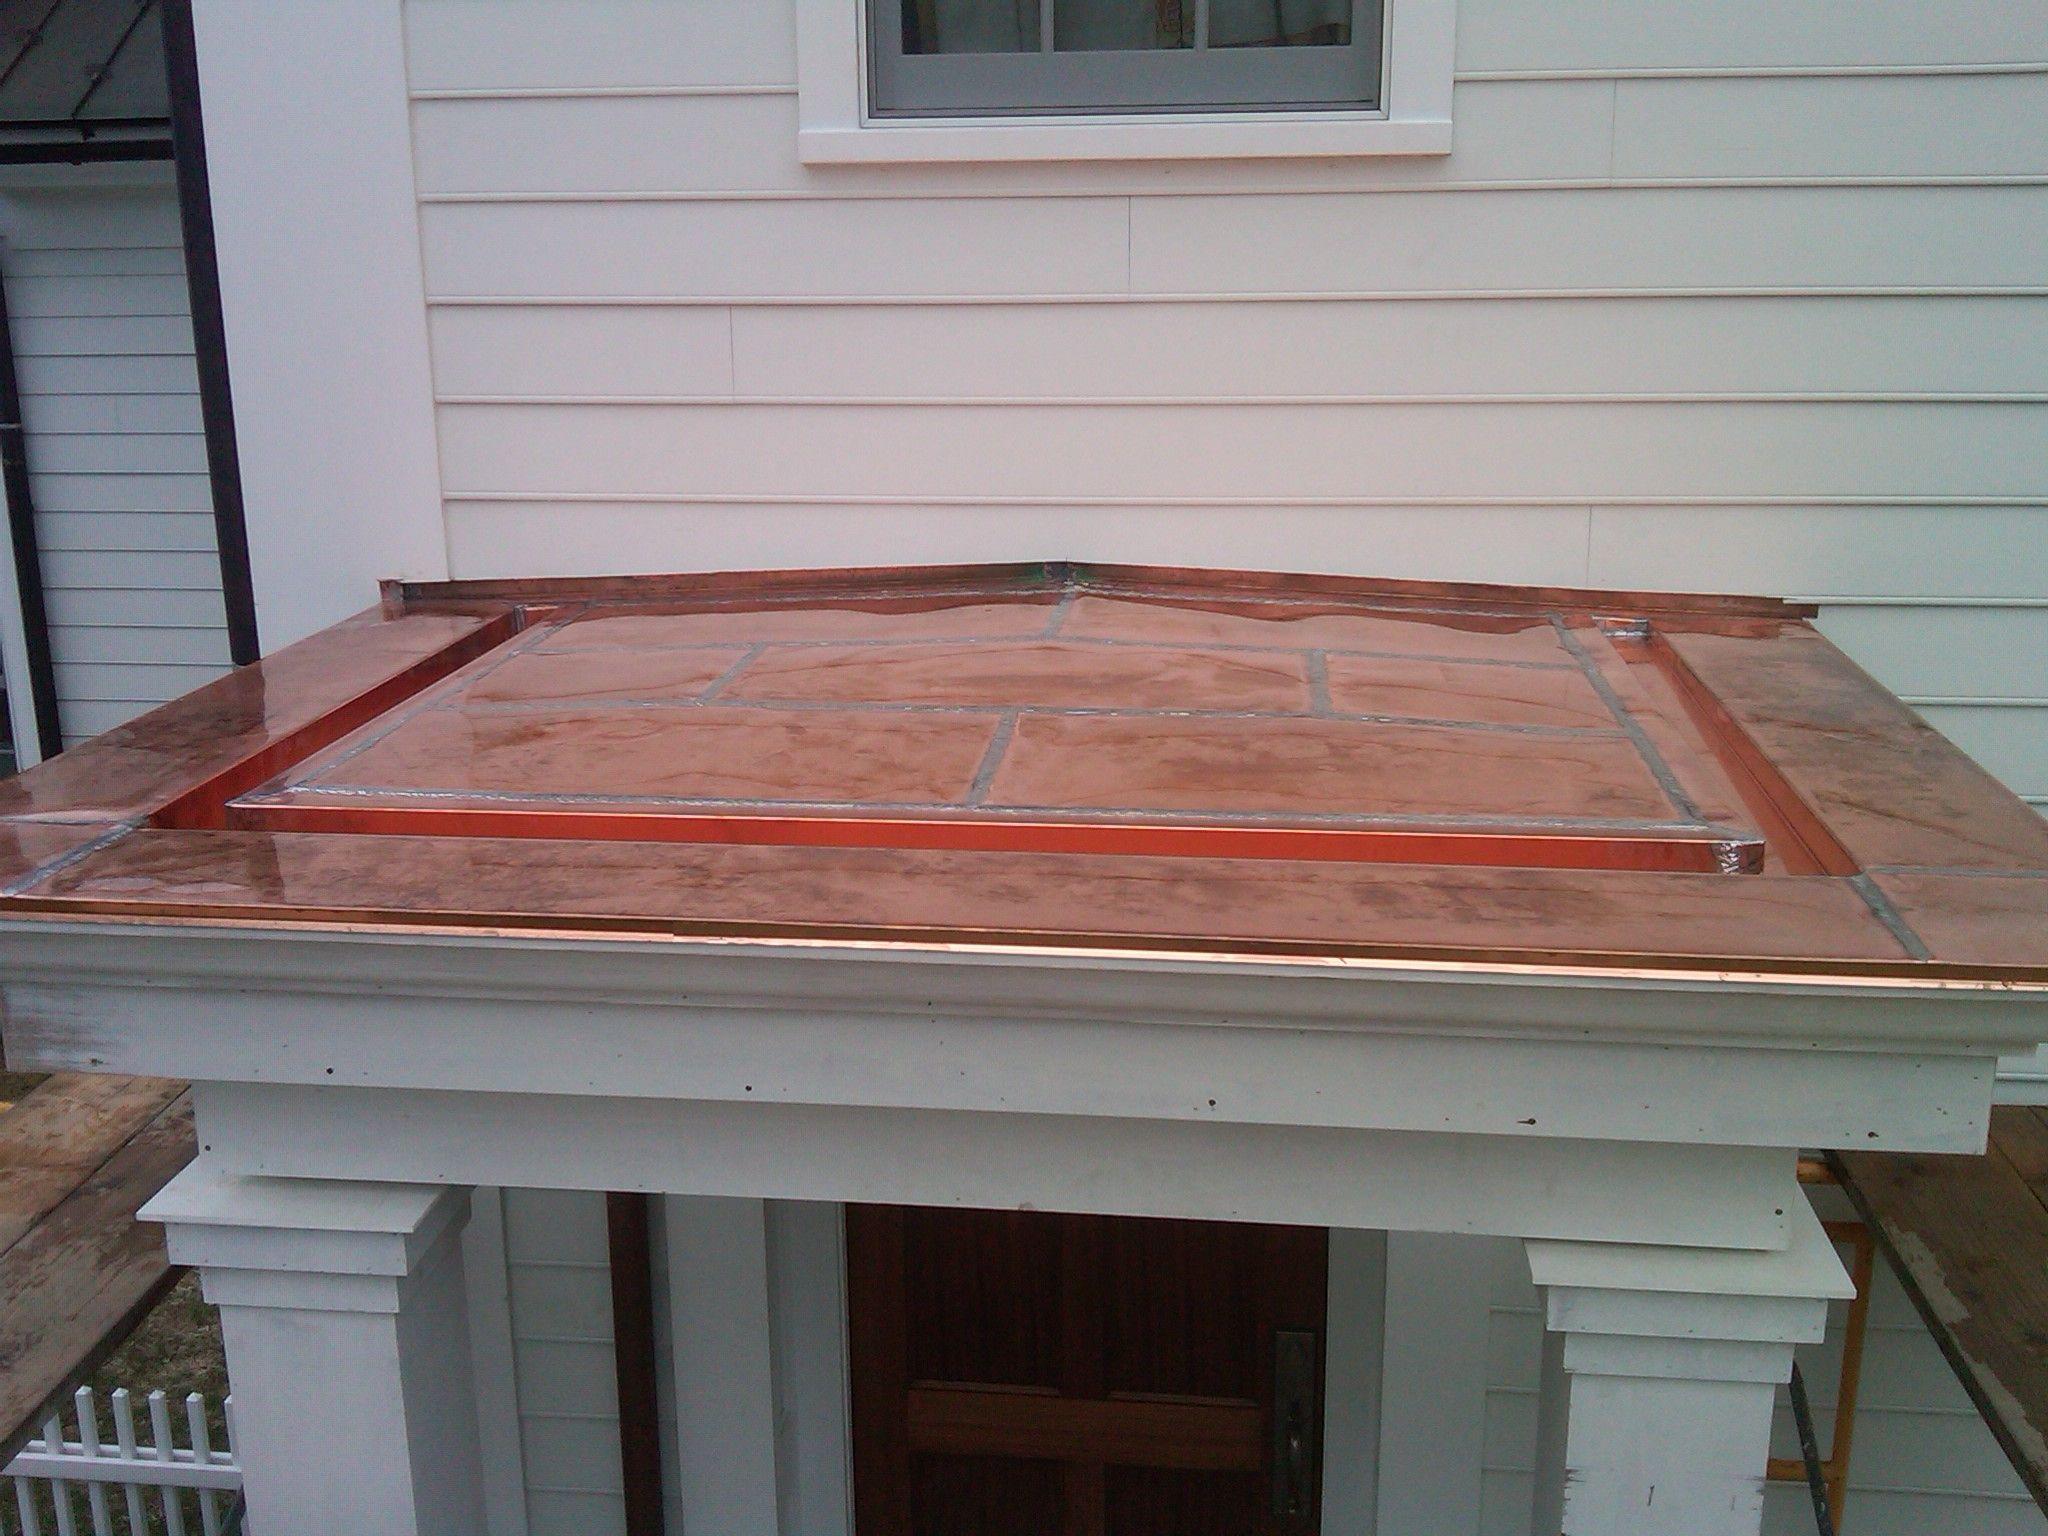 Stanfordville Flat Seam Copper Roof New Dimension Construction Copper Roof Roof Copper